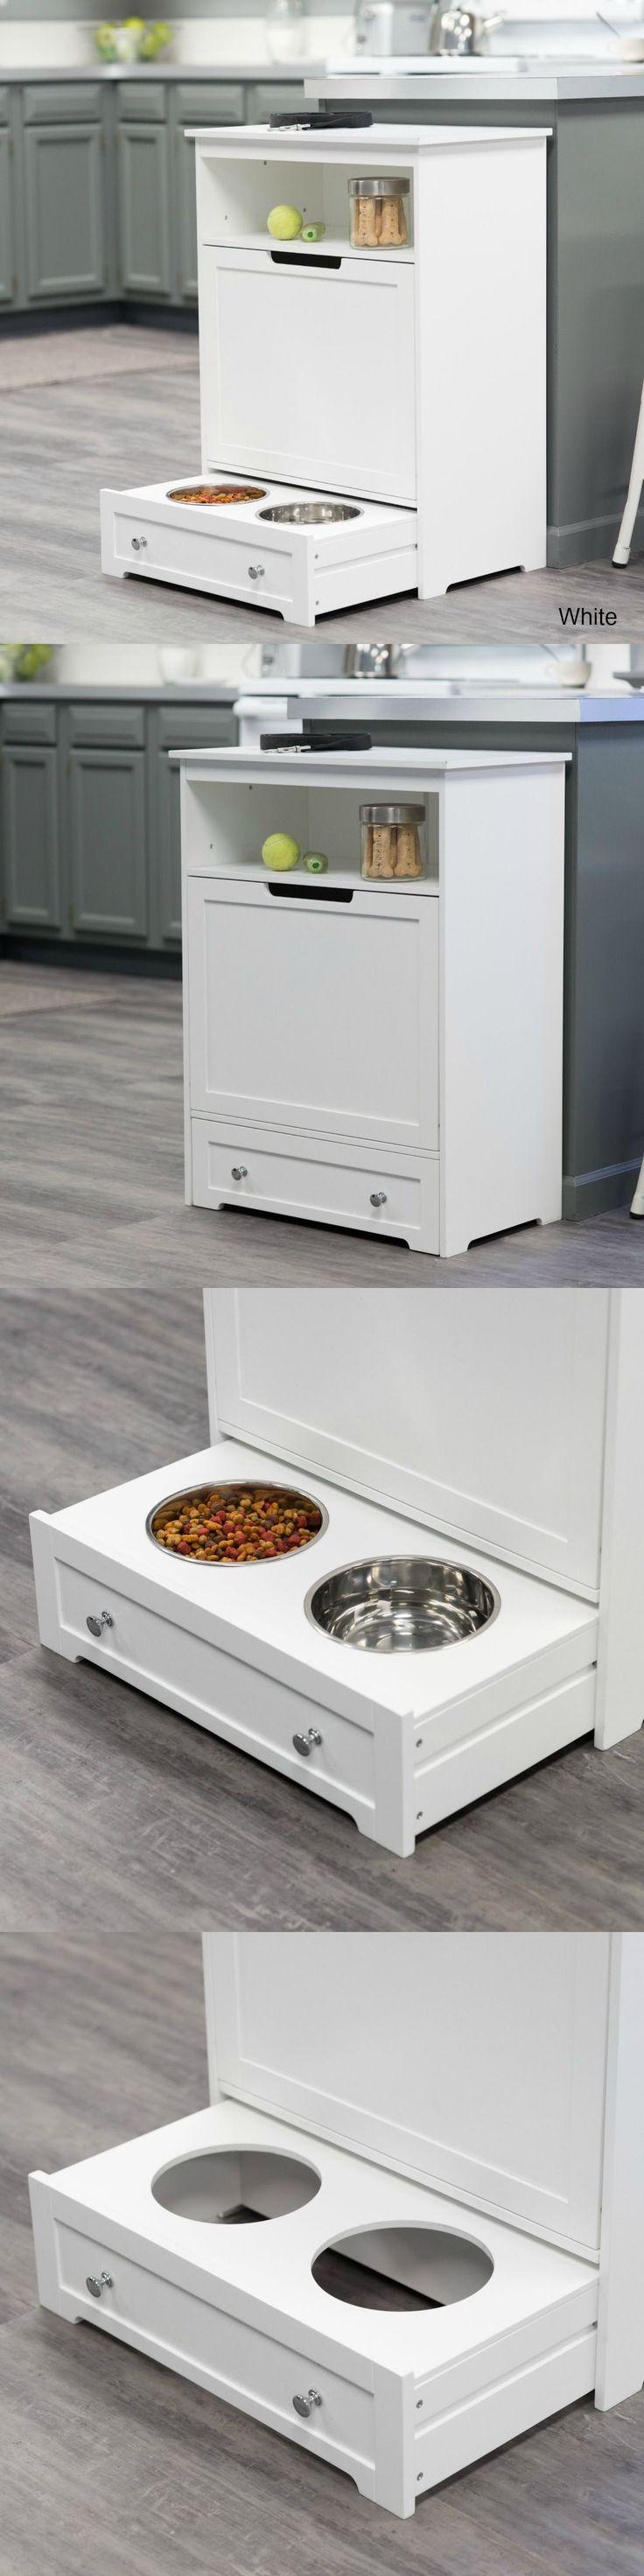 Design For Angled Dog Food Feeding Station